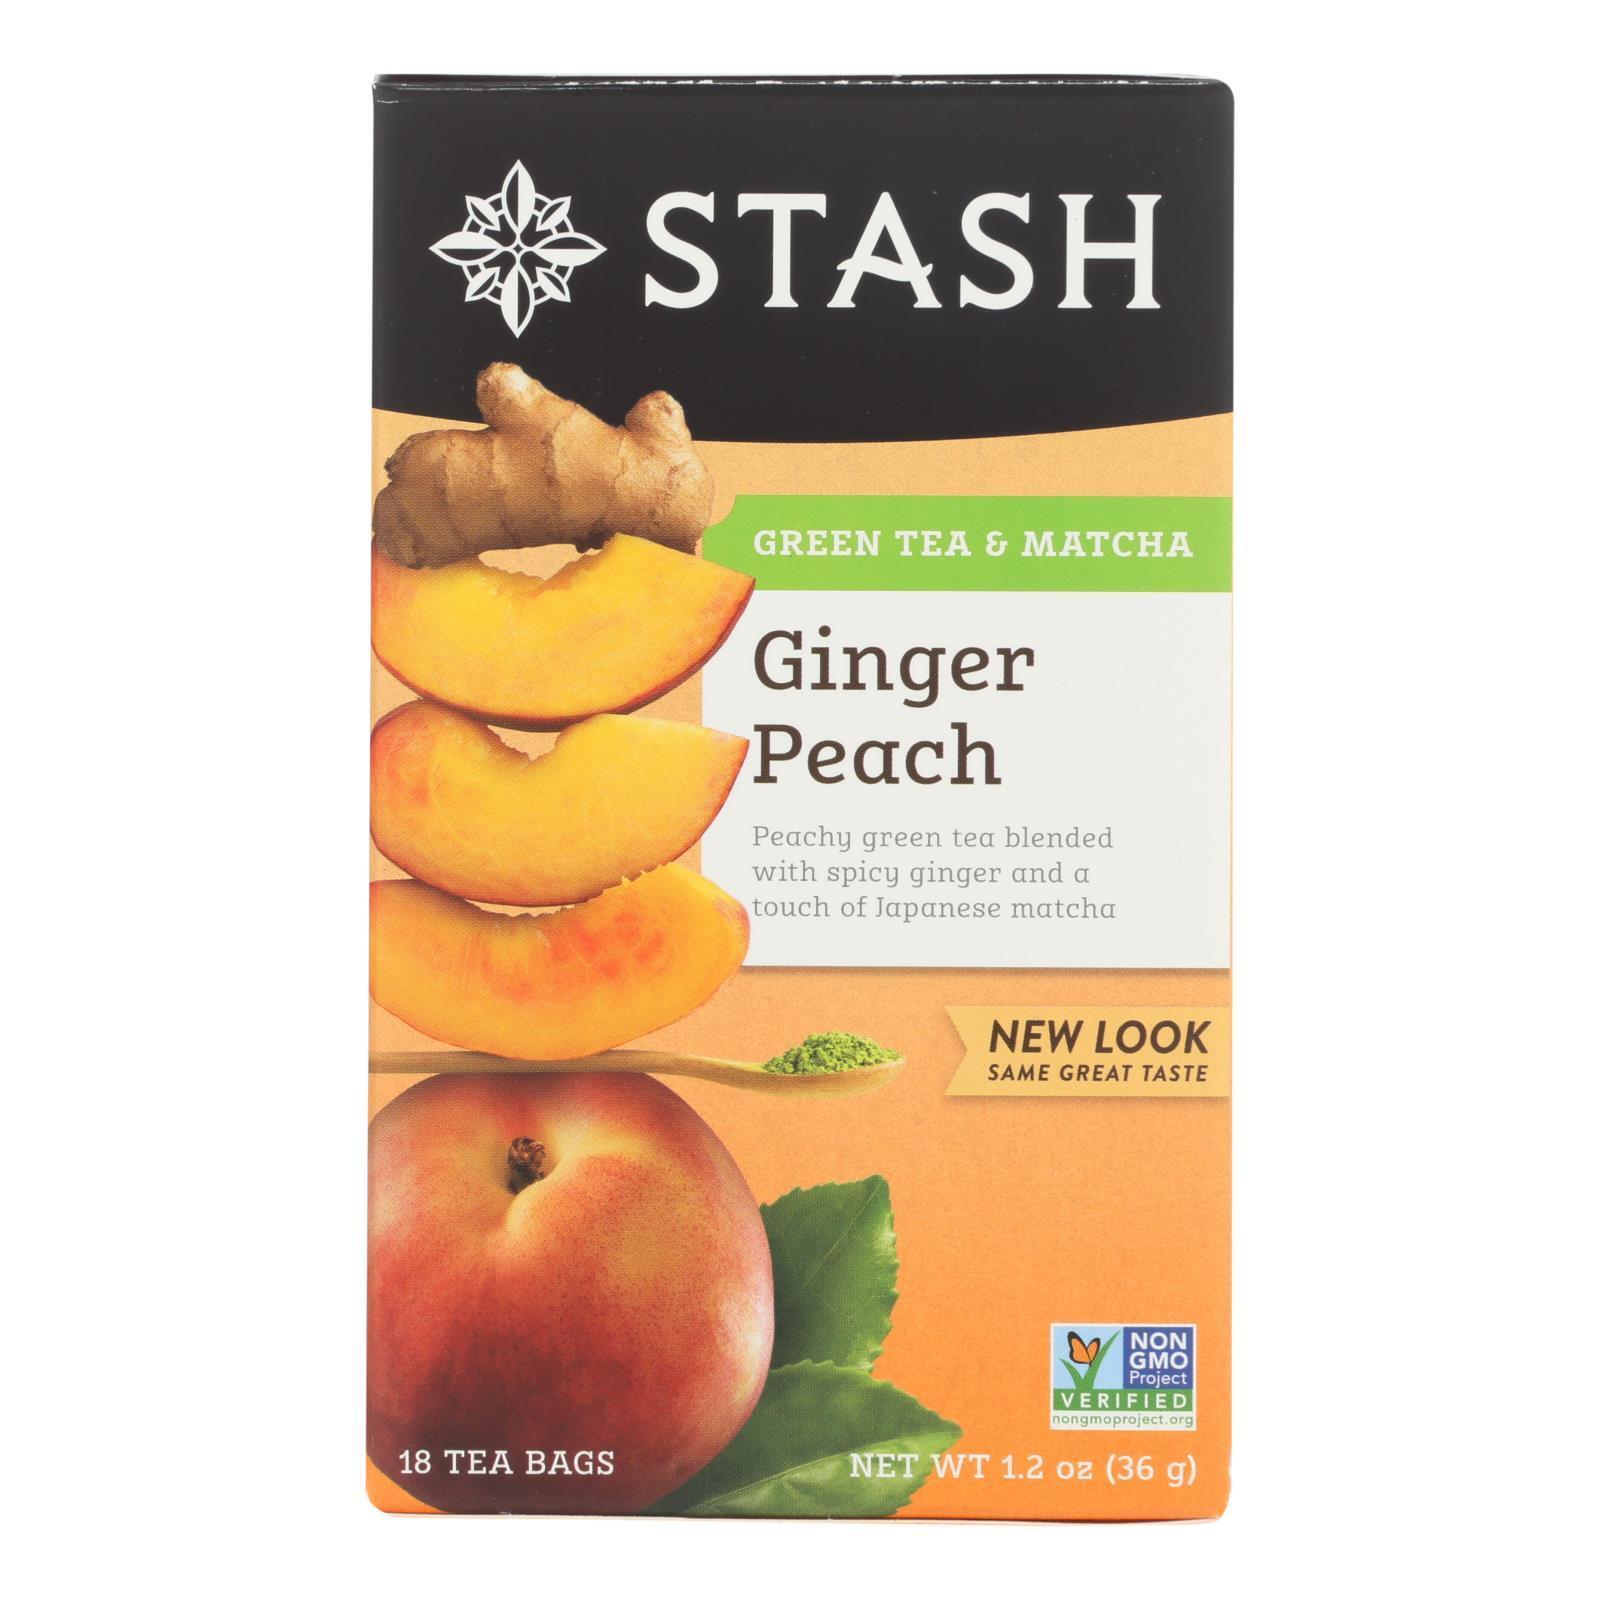 Stash Tea Ginger Peach Green W/ Matcha - 18 Tea Bags - Case of 6